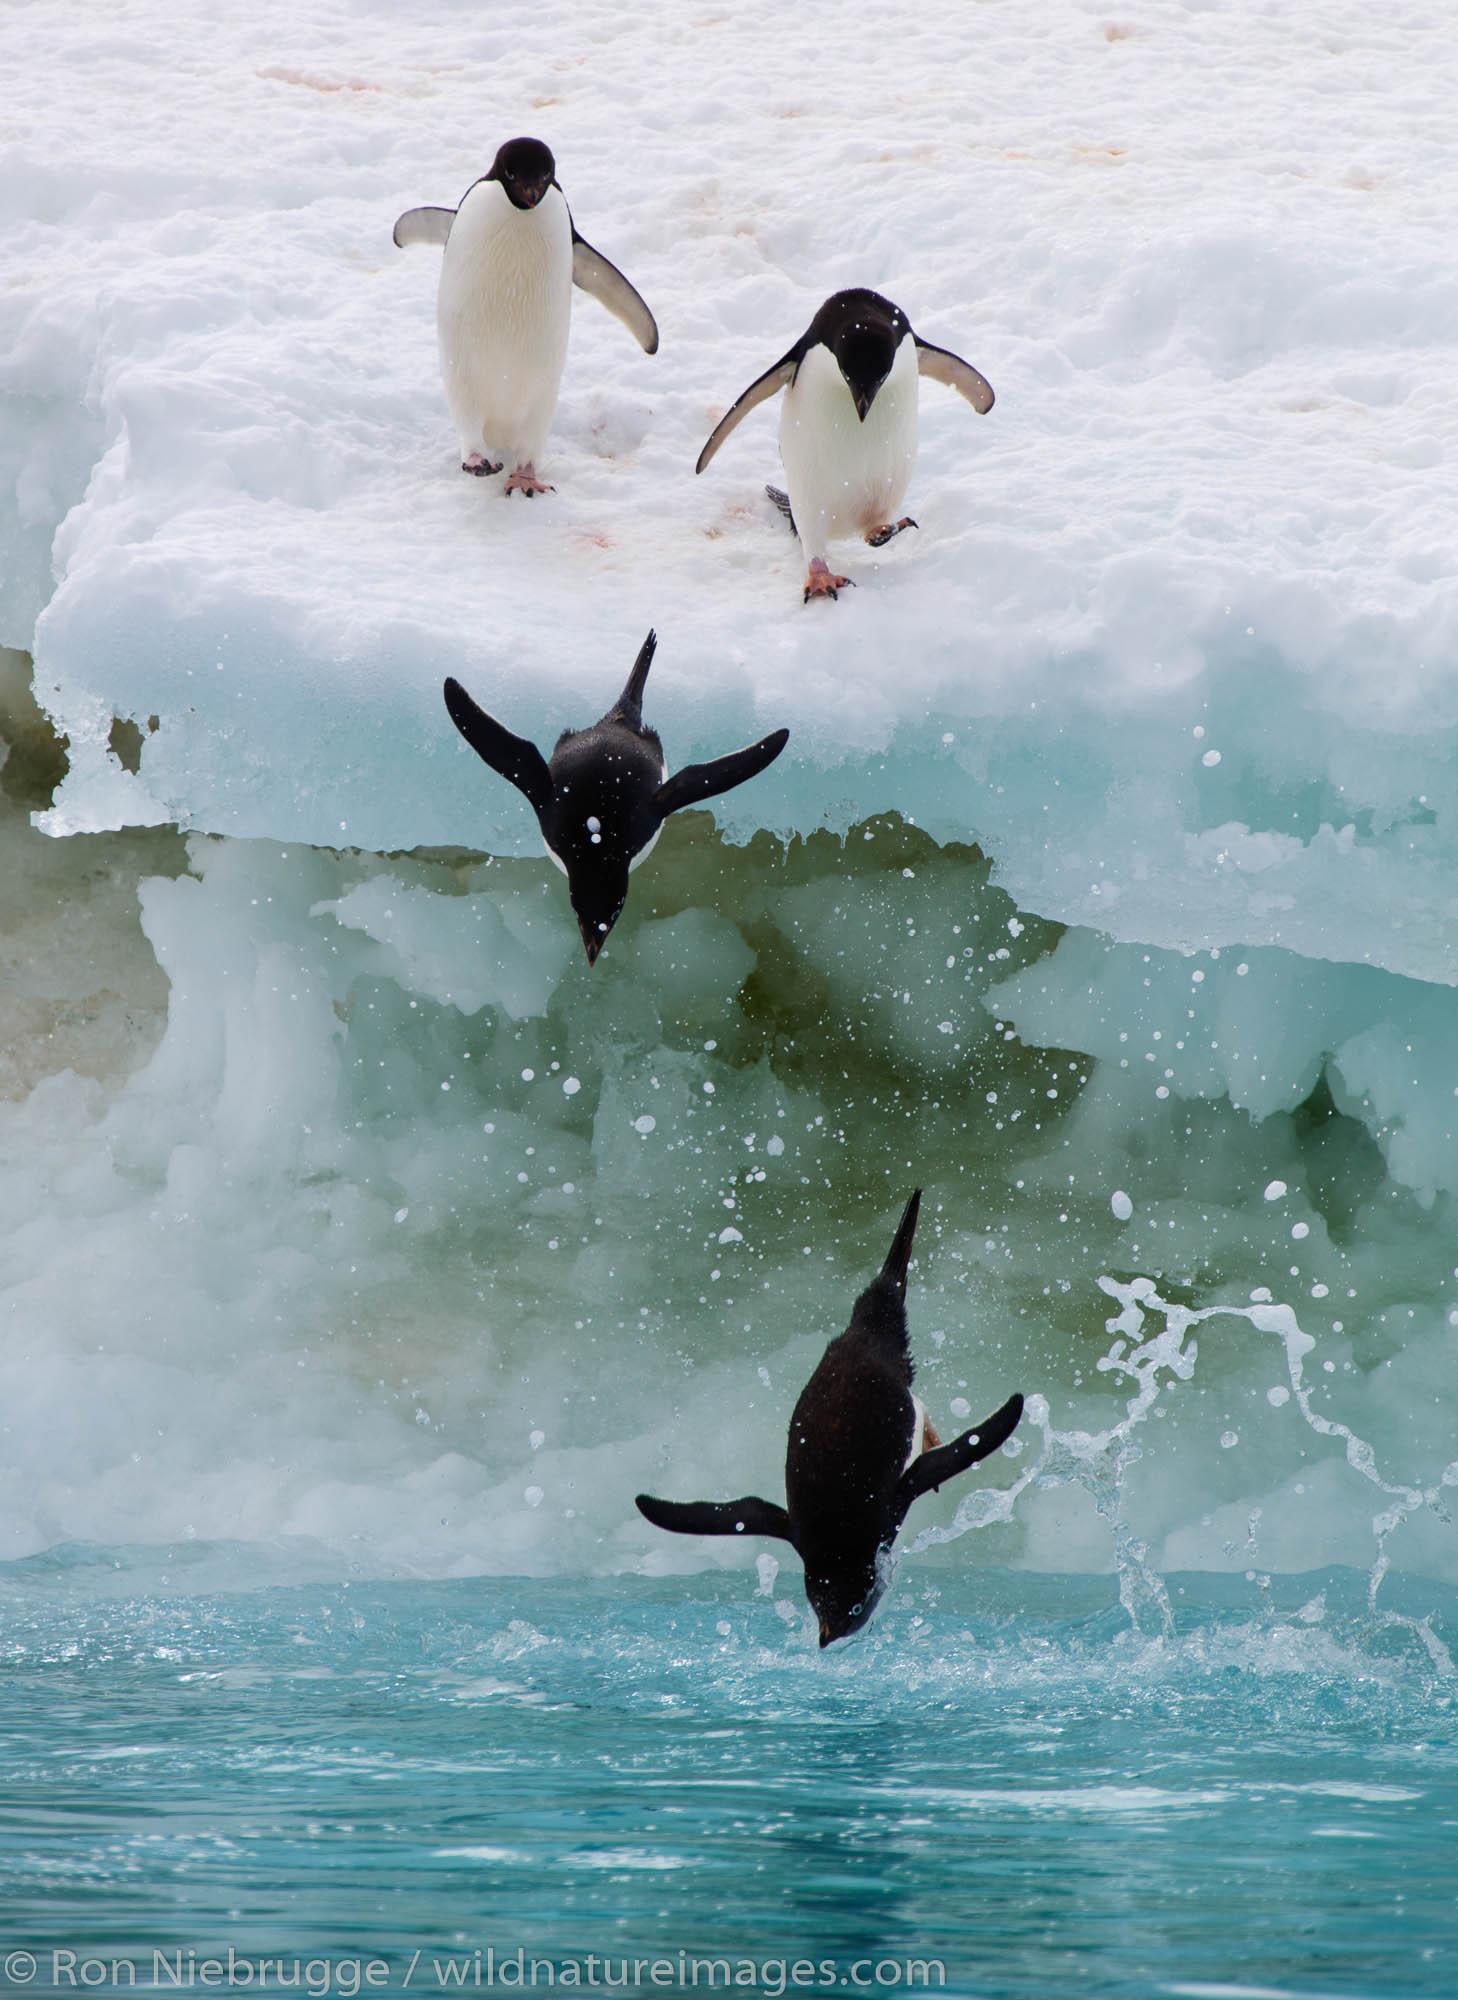 Adélie Penguins, (Pygoscelis adeliae) Icebergs at Brown Bluff, Antarctica.